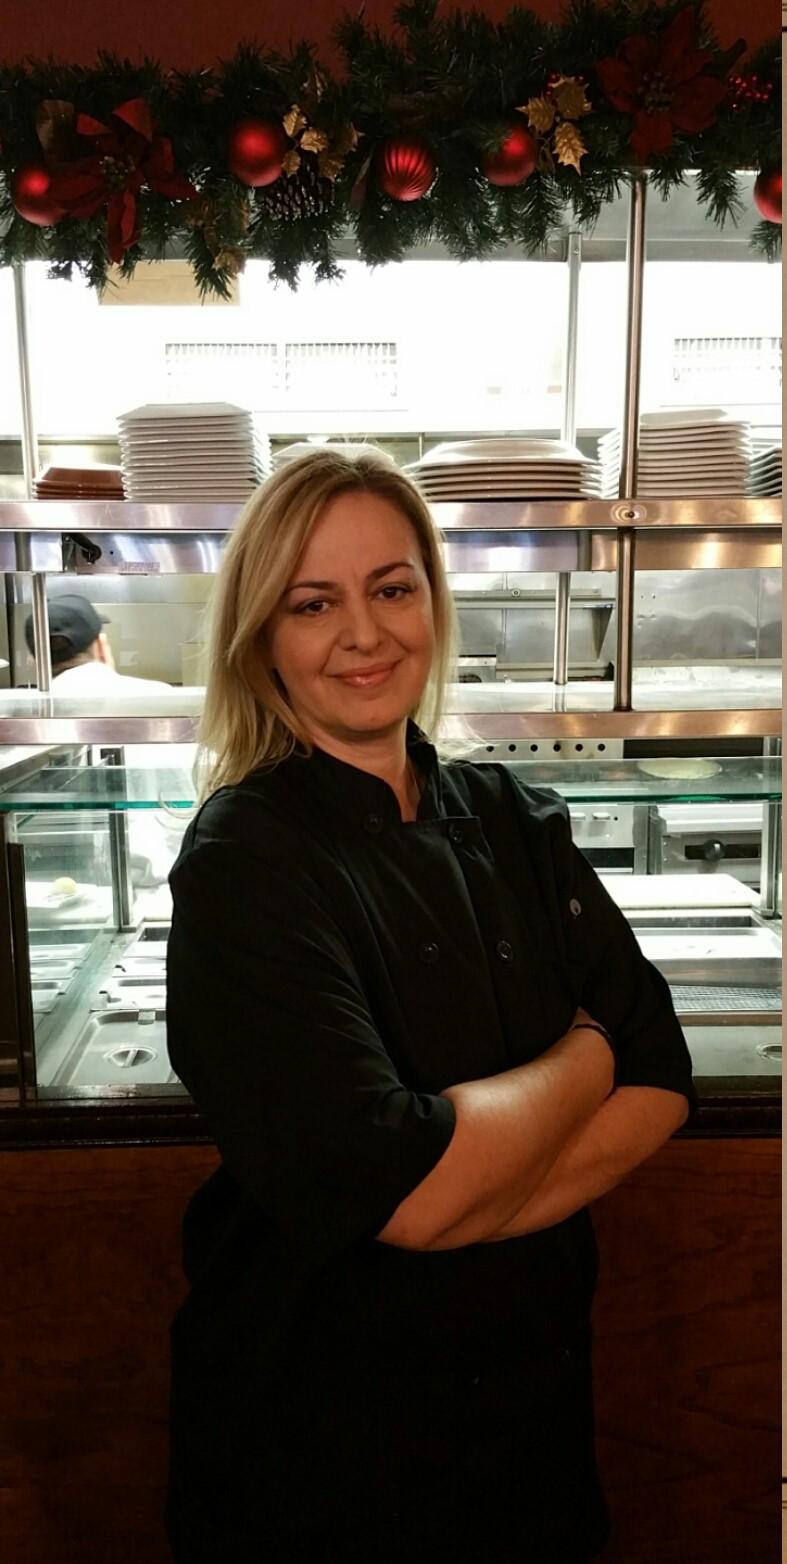 Chef Maria Petridis